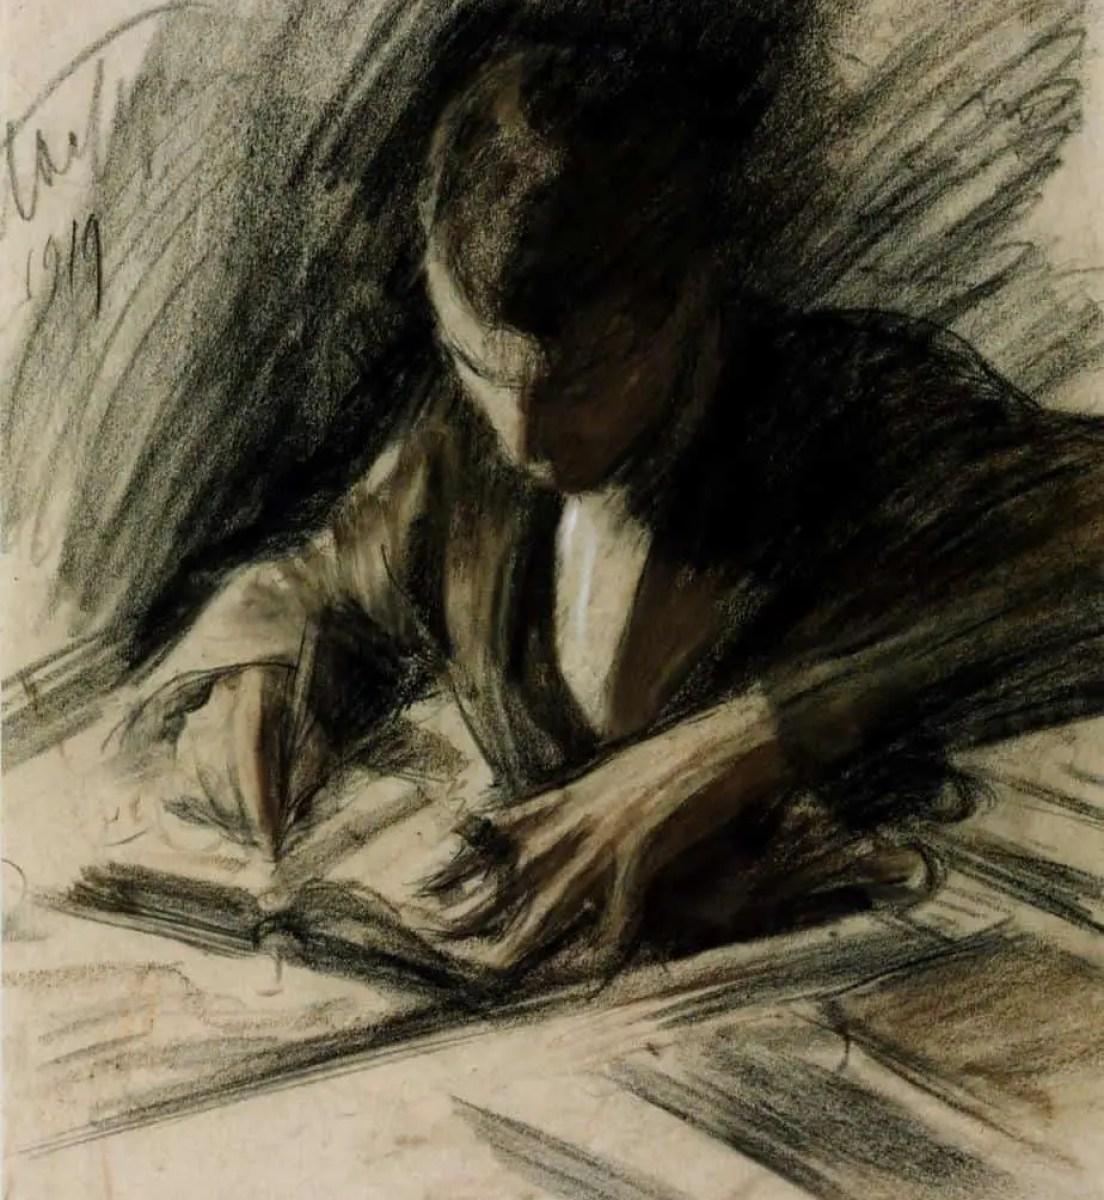 Leonid Pasternak Boris Pasternak Writing 1919